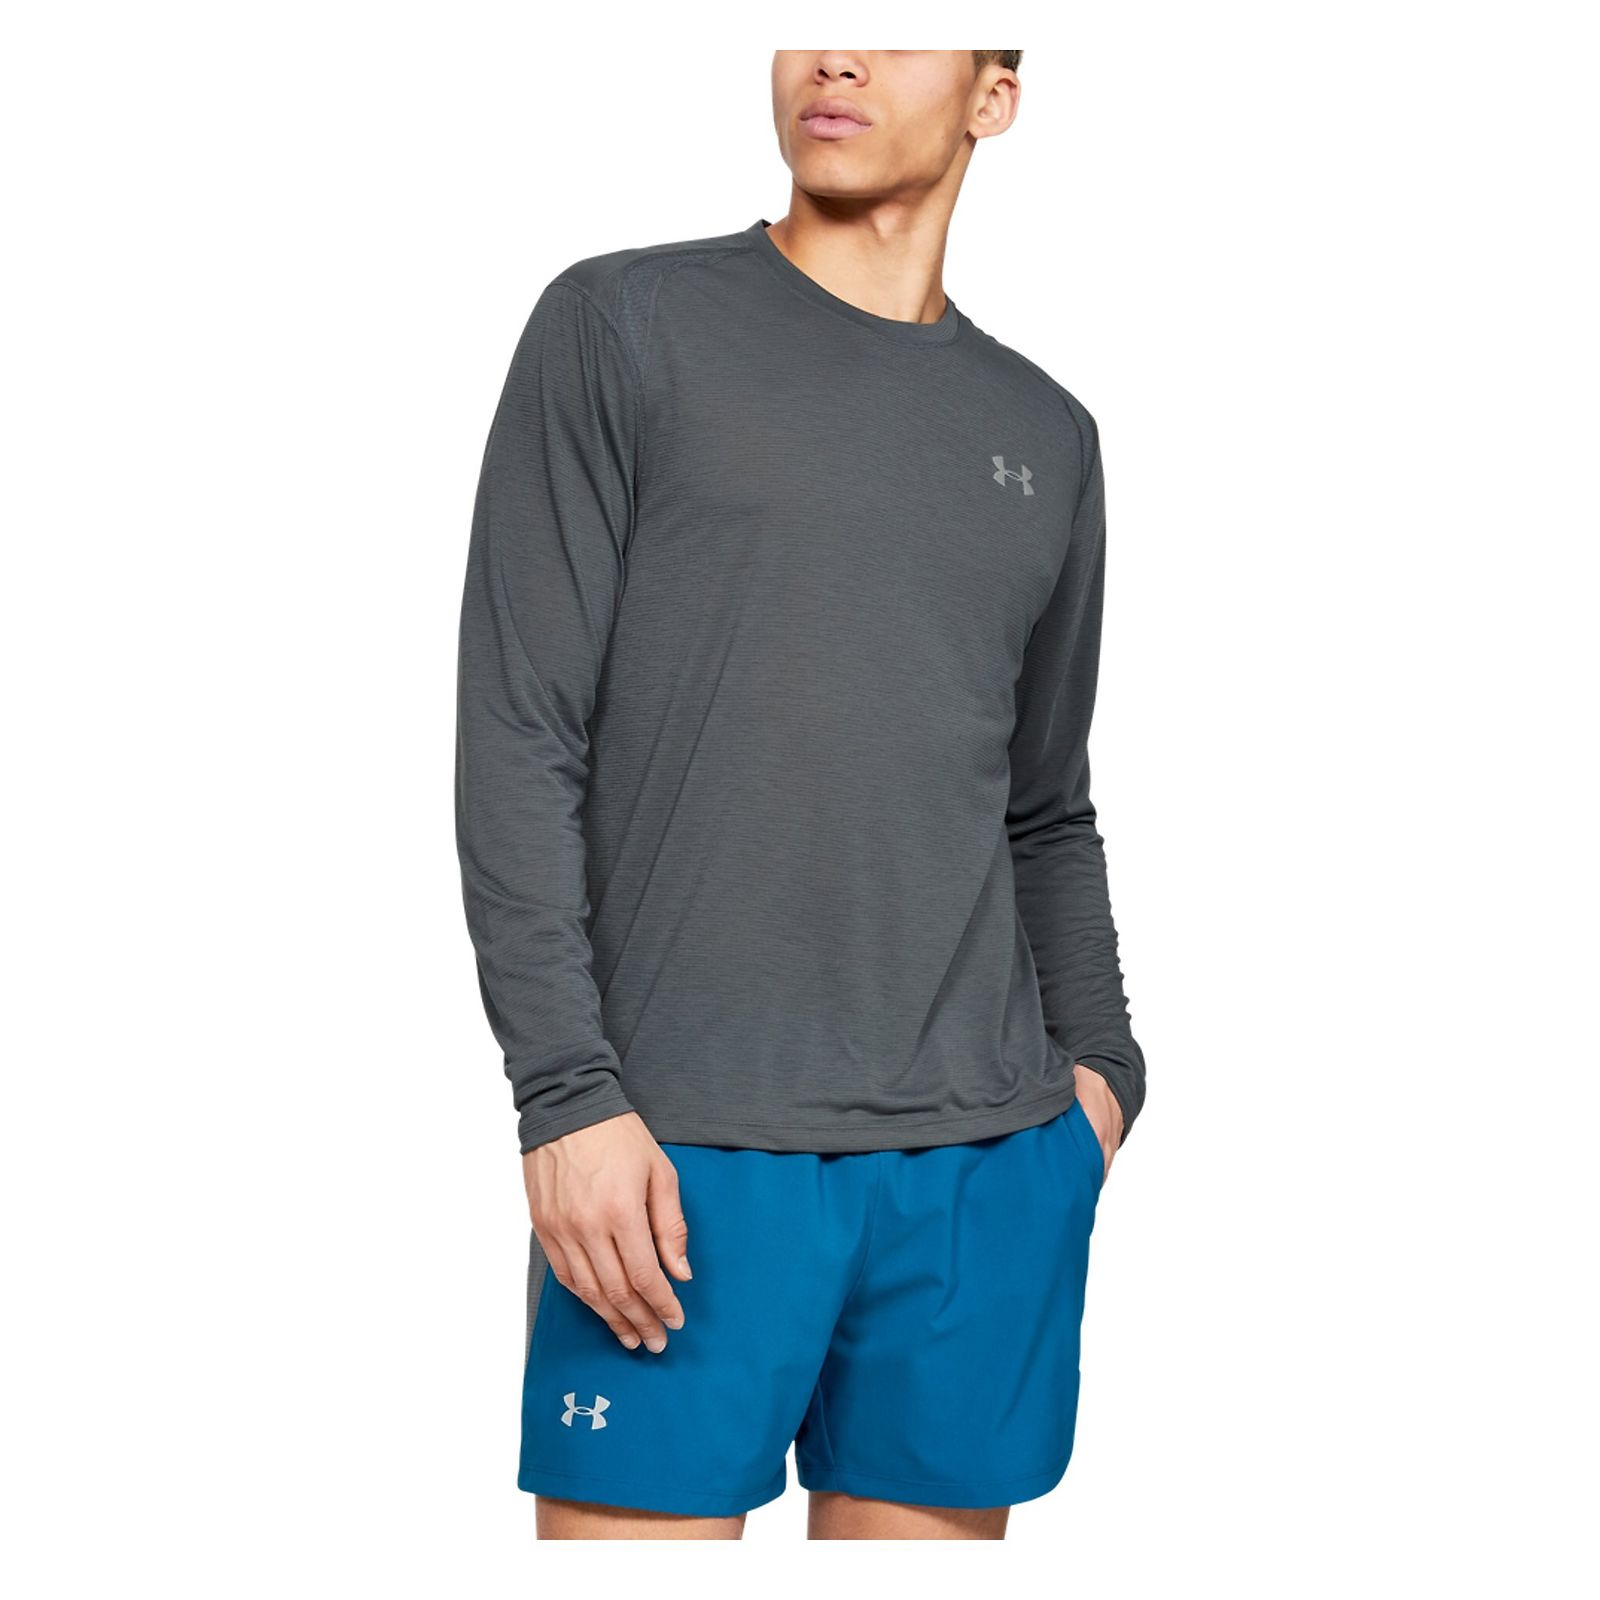 Koszulka męska do biegania Under Armour Streaker 1326584